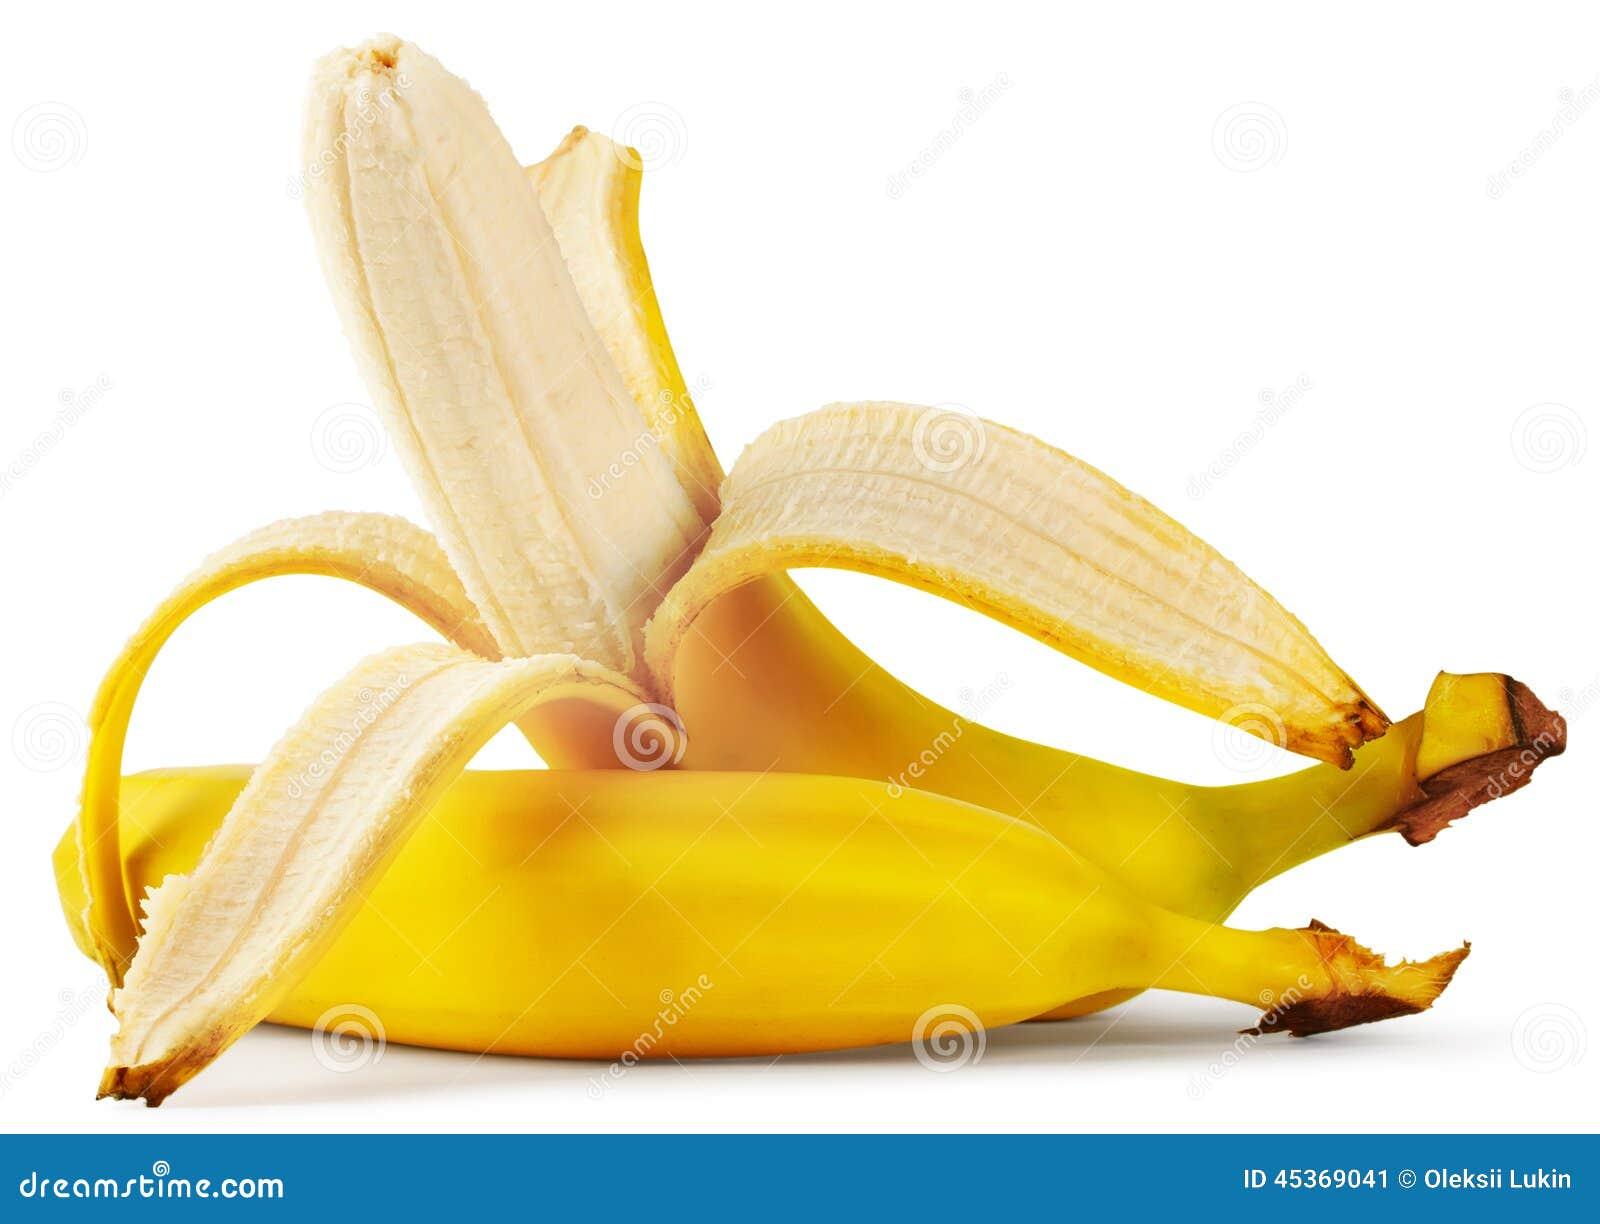 Banane épluchée mûre